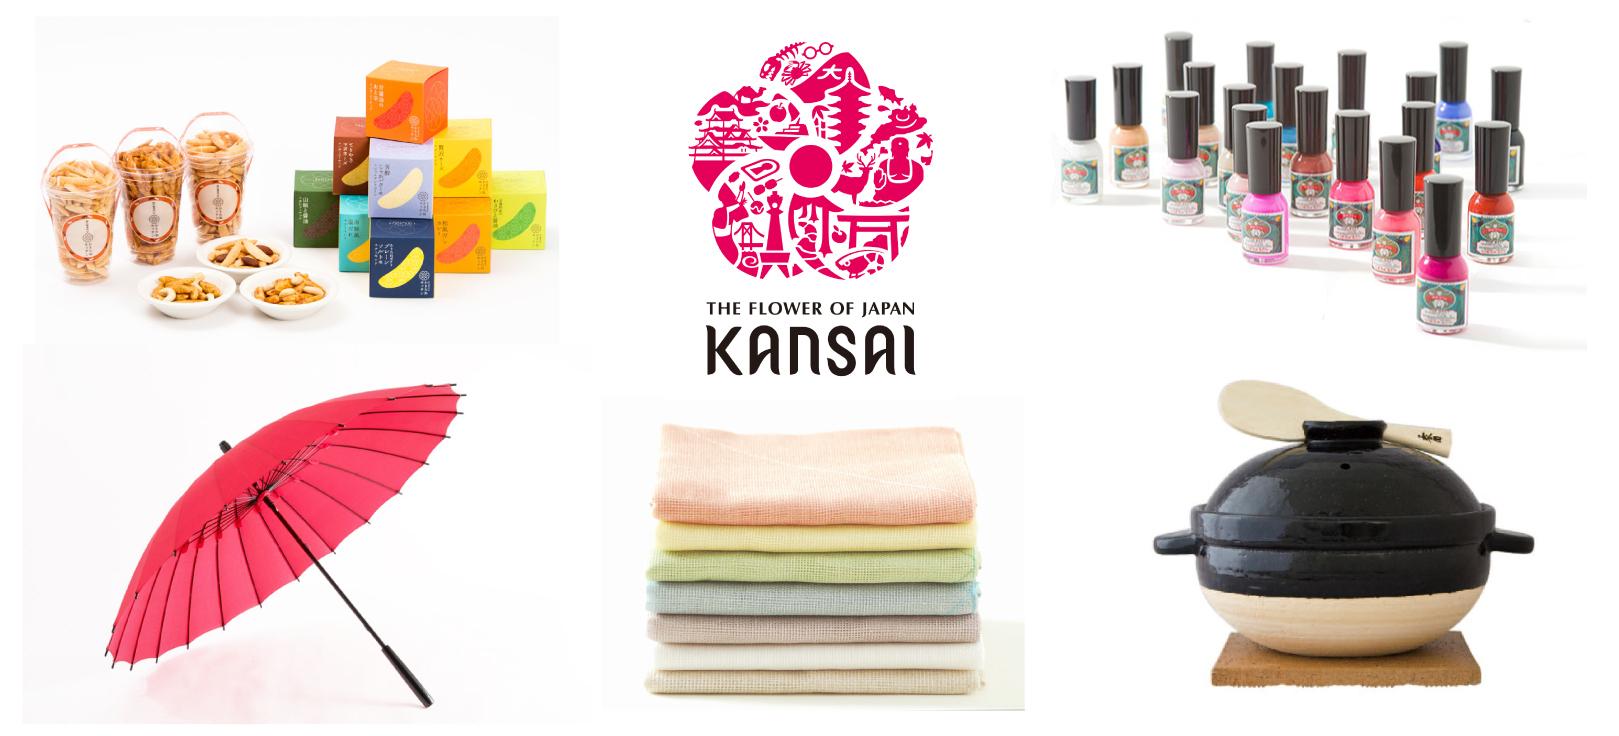 Hanayaka Kansai Selection 2016获奖商品